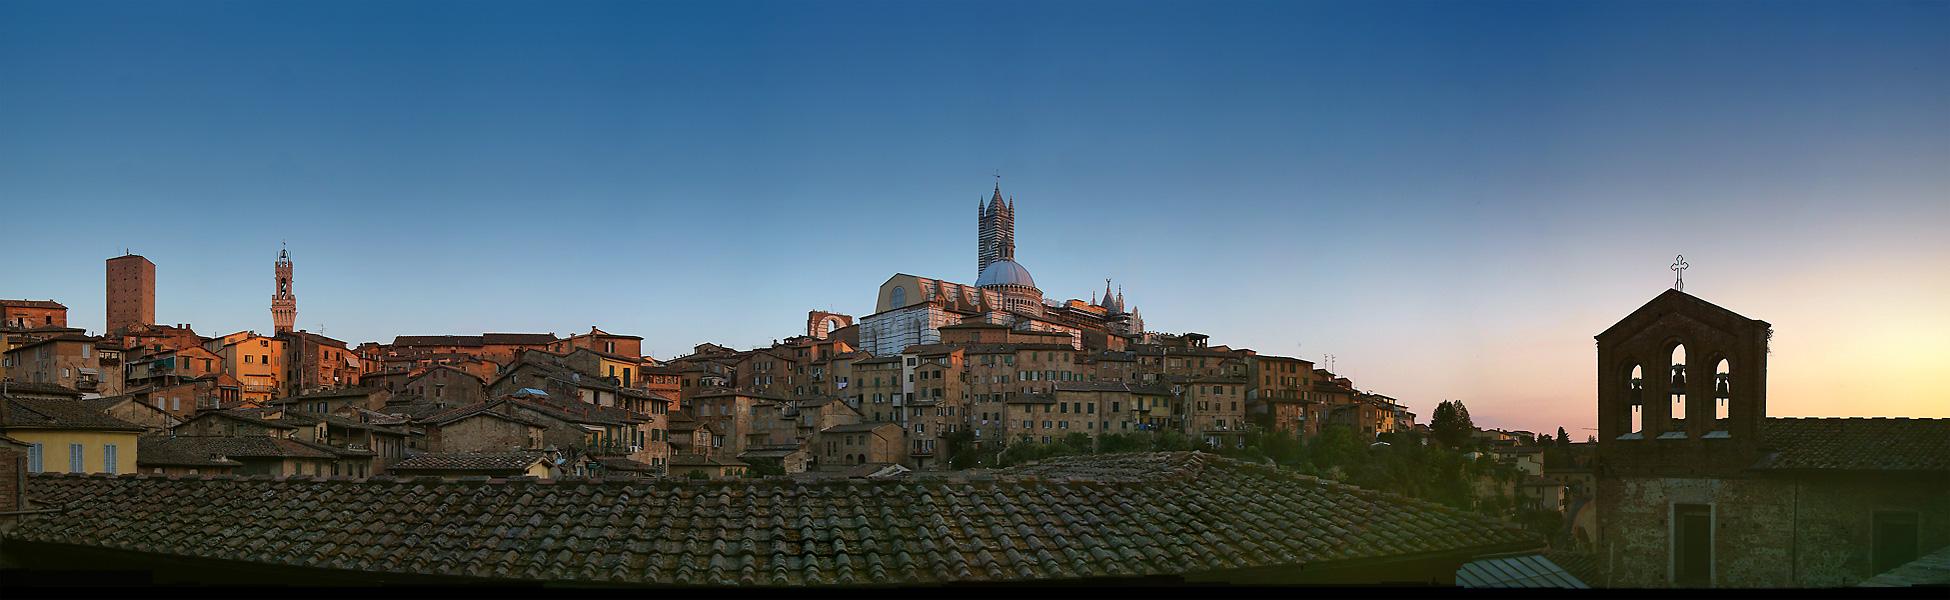 http://upload.wikimedia.org/wikipedia/commons/5/52/Toscana_Siena2_tango7174.jpg